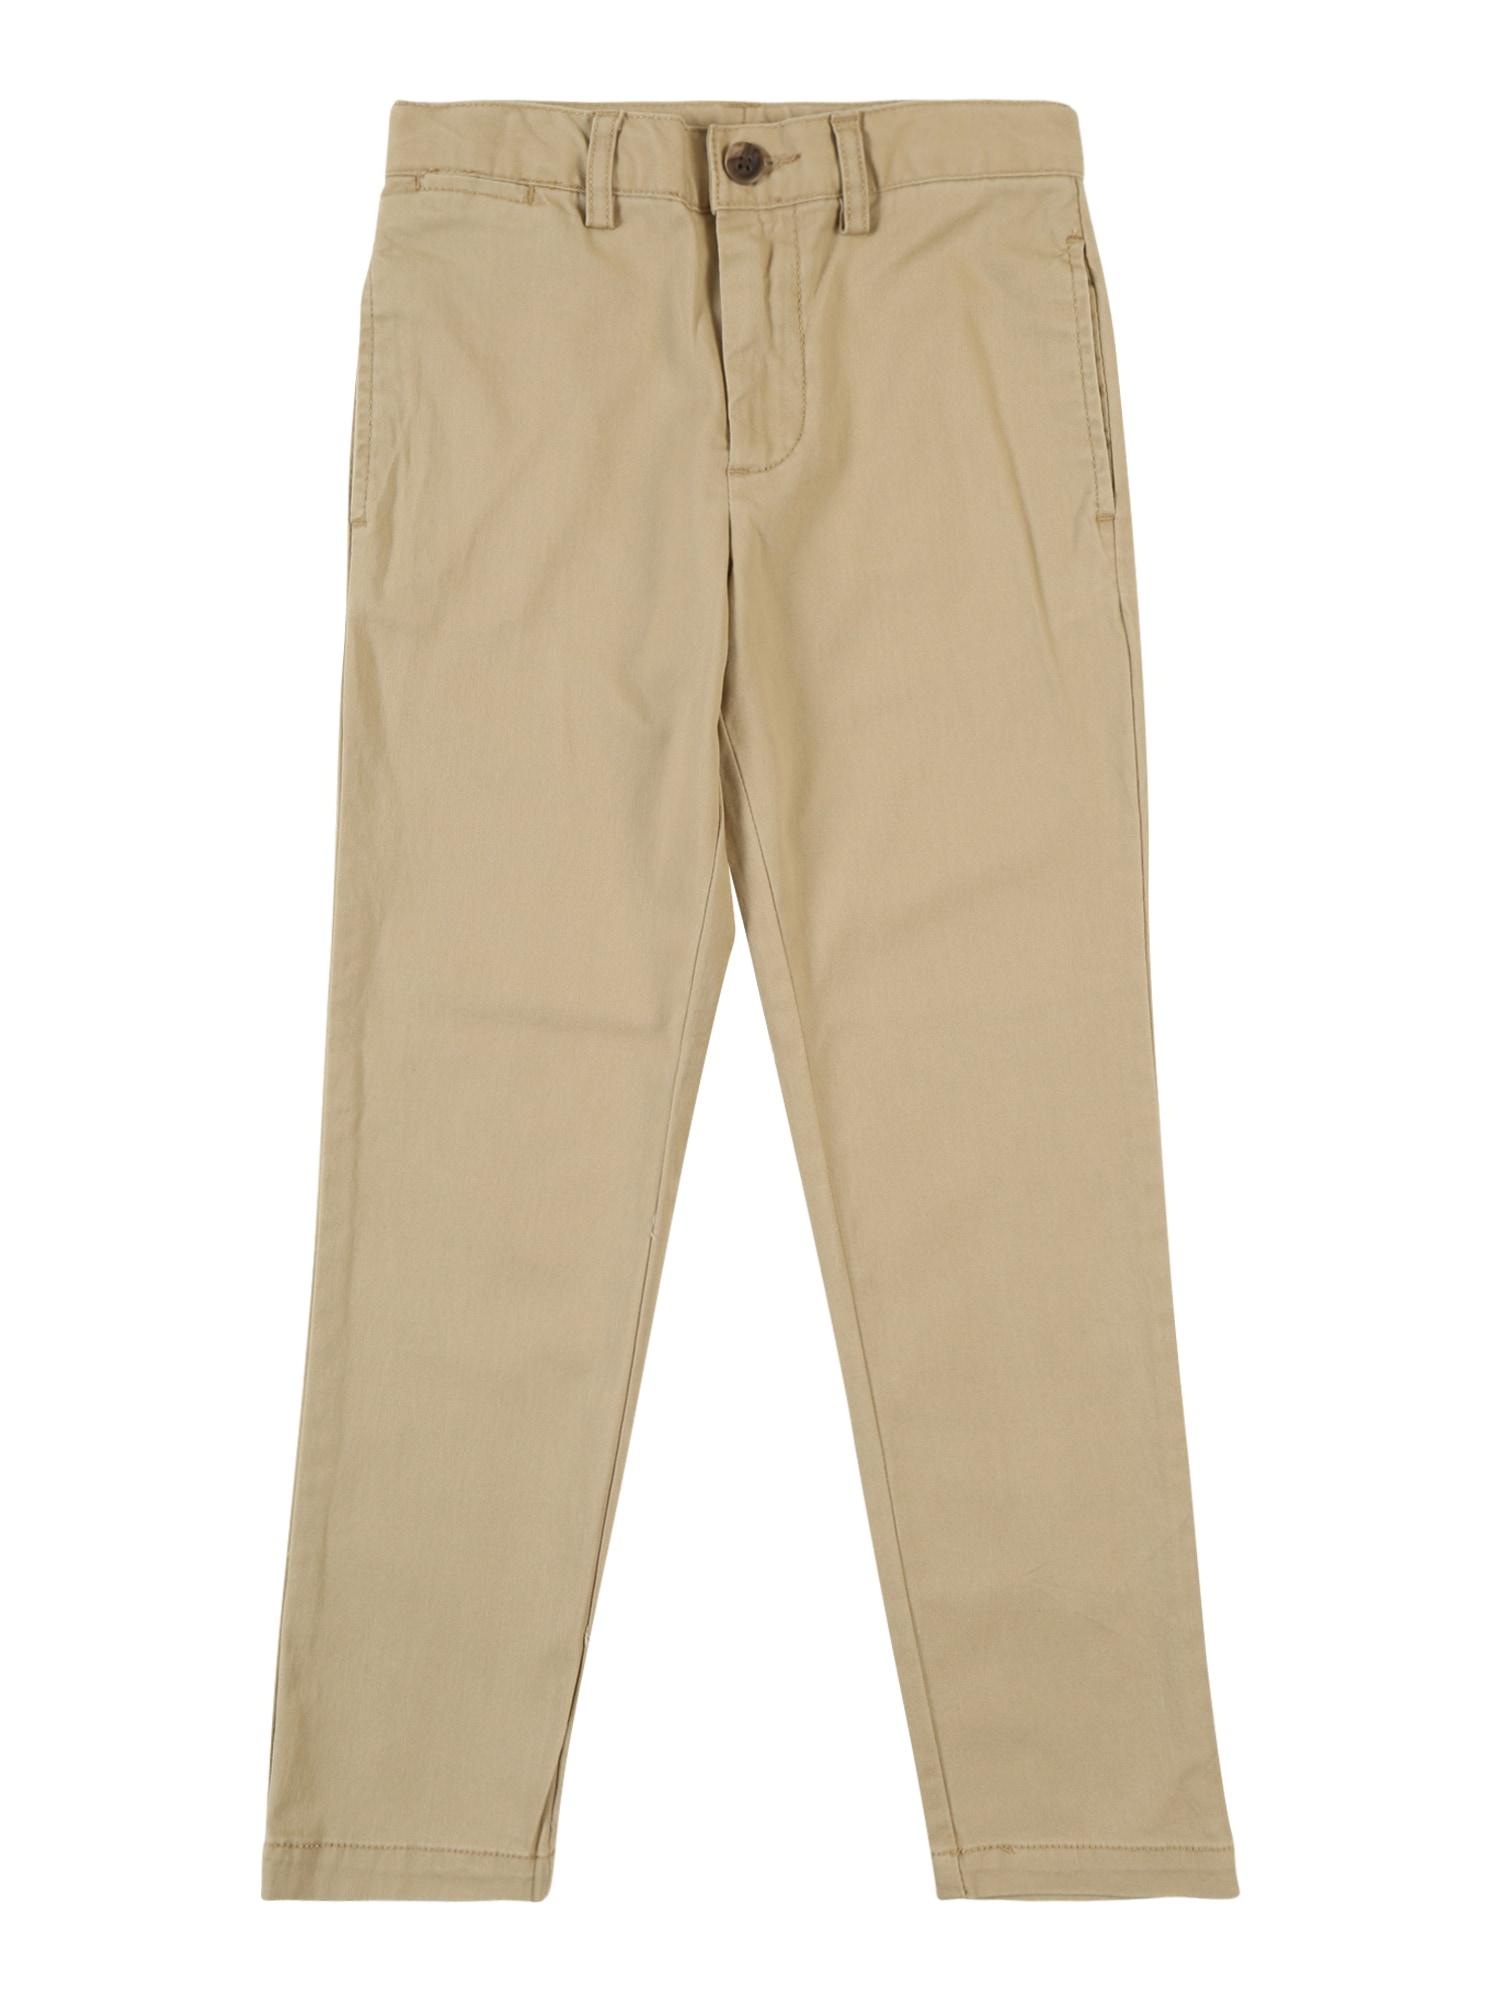 Kalhoty FLAT FRONT khaki POLO RALPH LAUREN